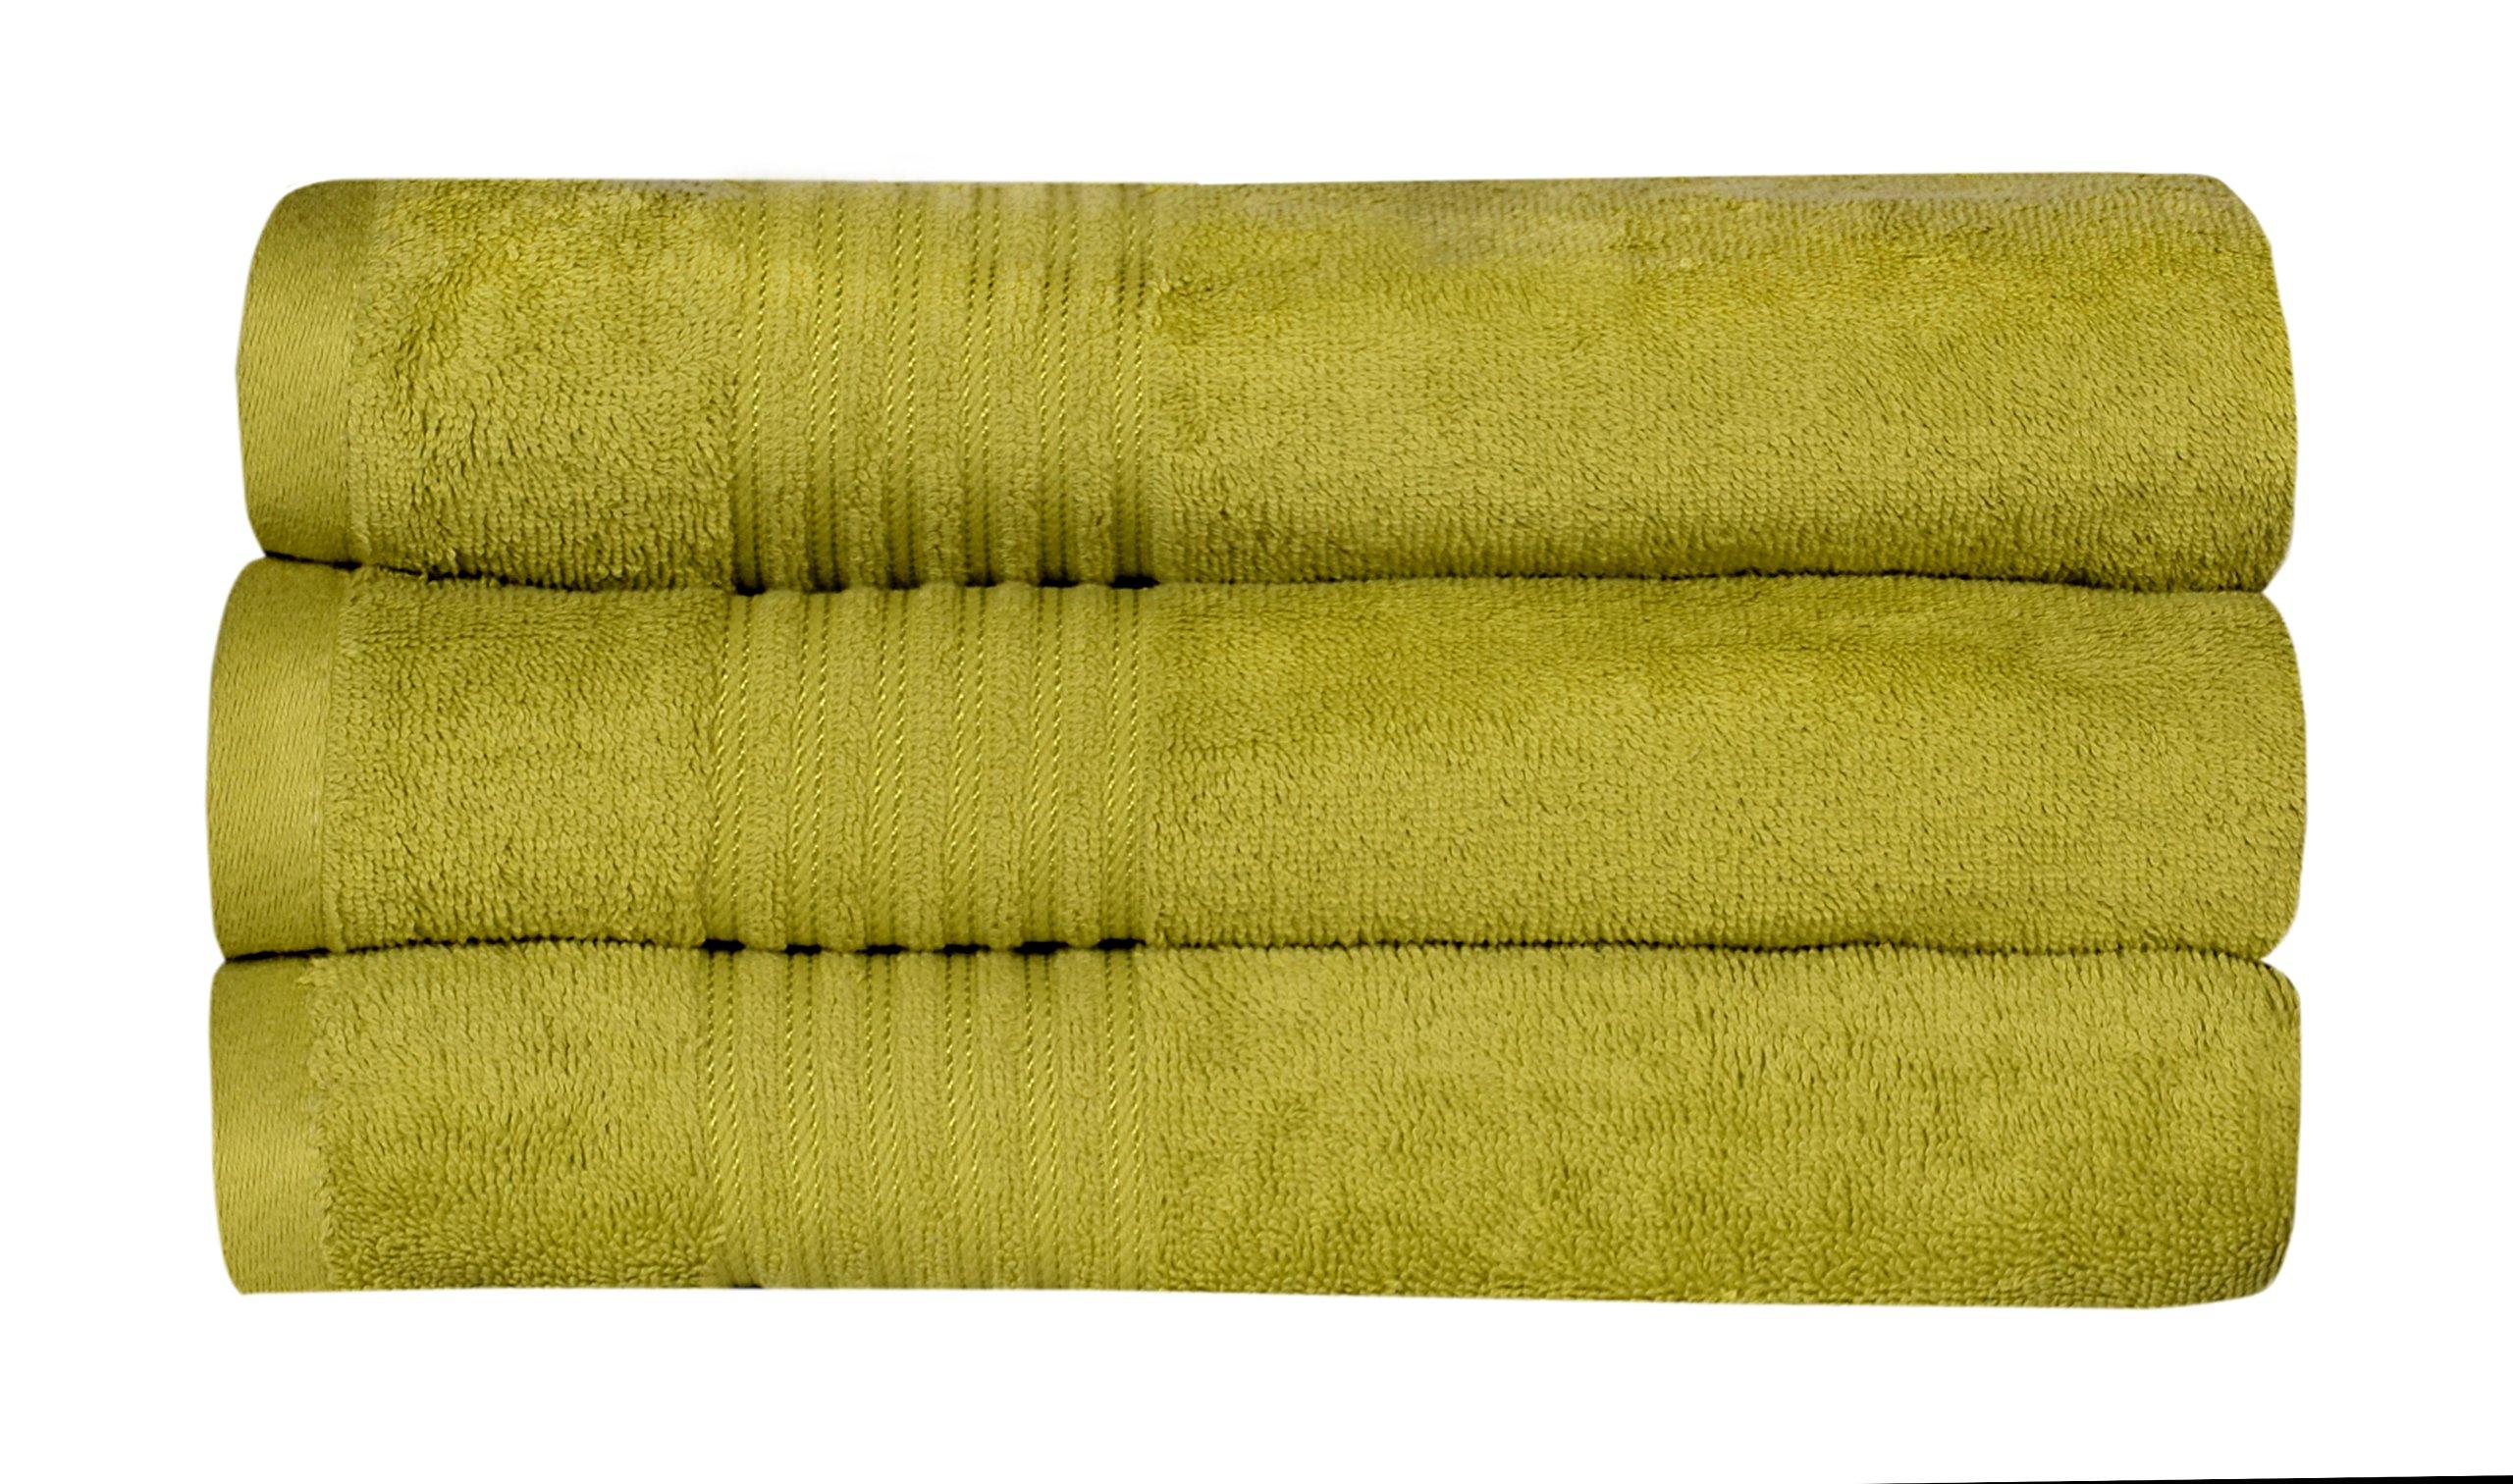 Casa Copenhagen 575 GSM (16.96oz/yd²) Cotton 35 x 70 inch 3 pack Bath Towels/Sheets - Neon Green